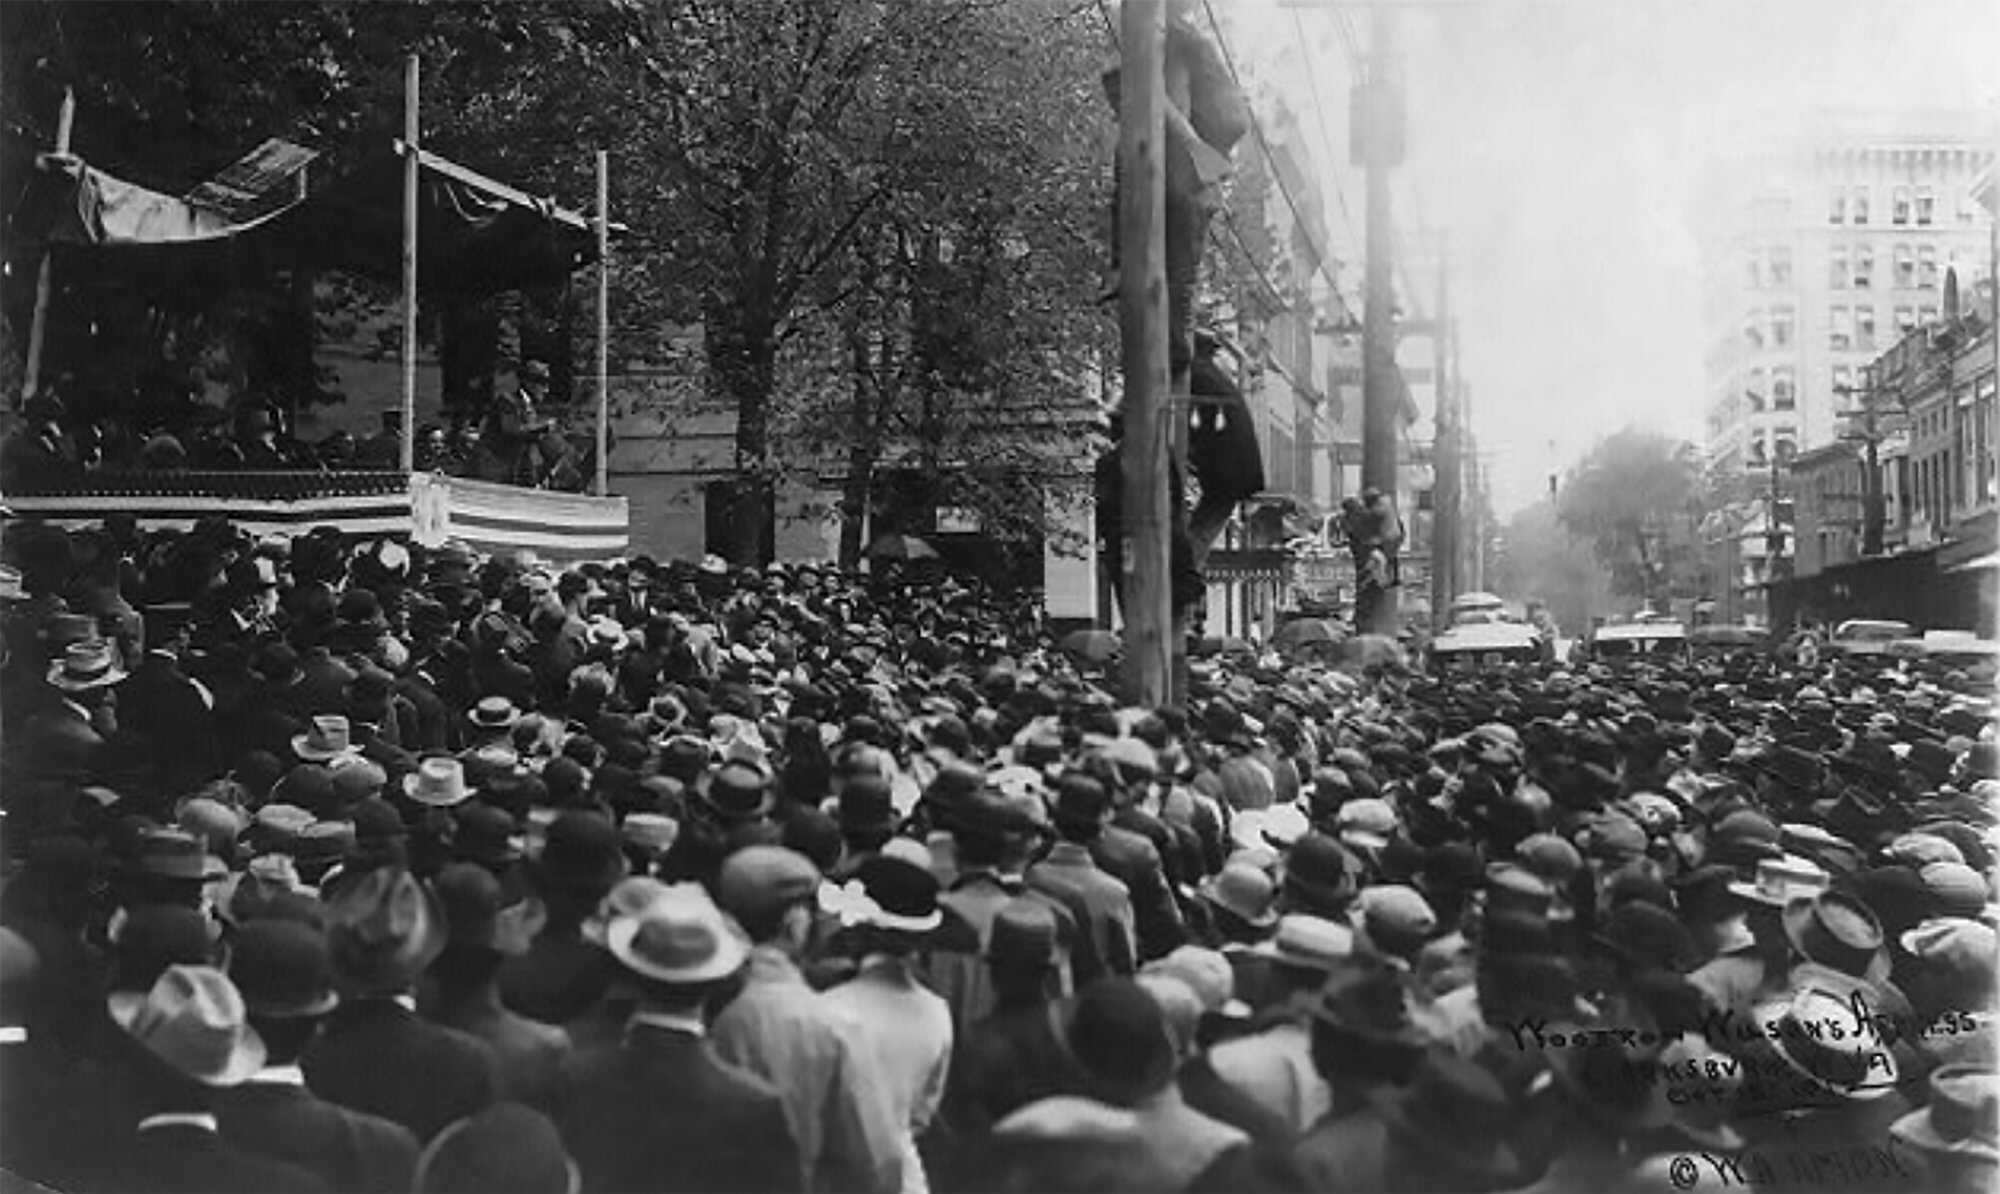 Wilson-election-Speaking-to-crowd,-W.-VA.1912.jpg